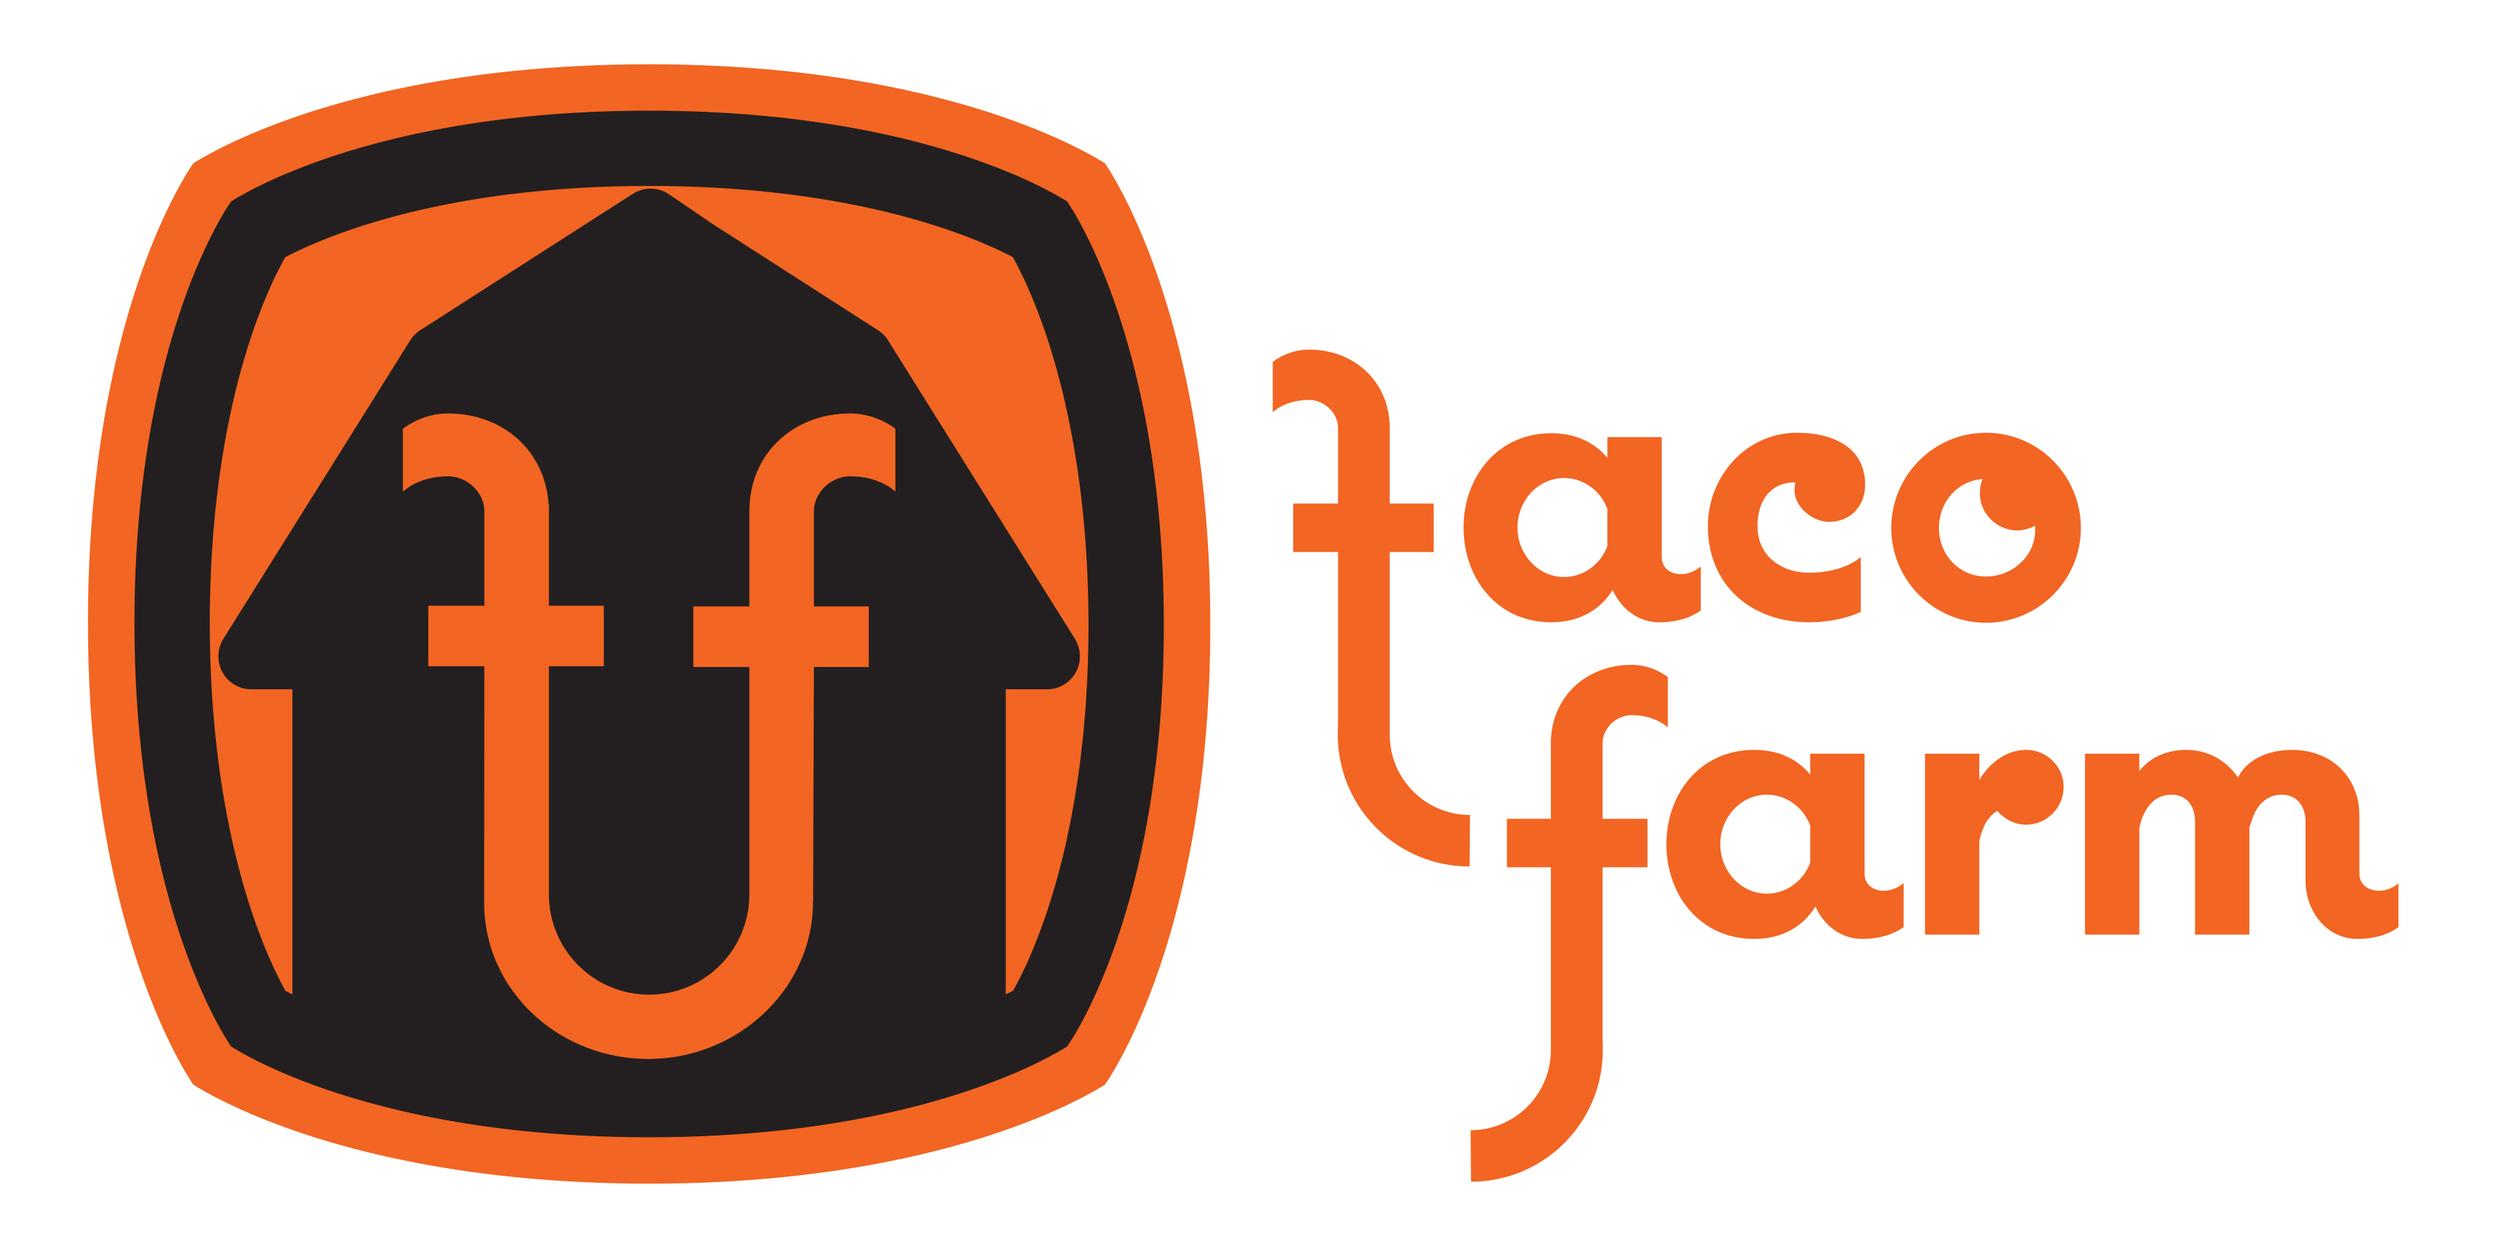 tacofarm - logo and wordmark - sidebyside.jpg